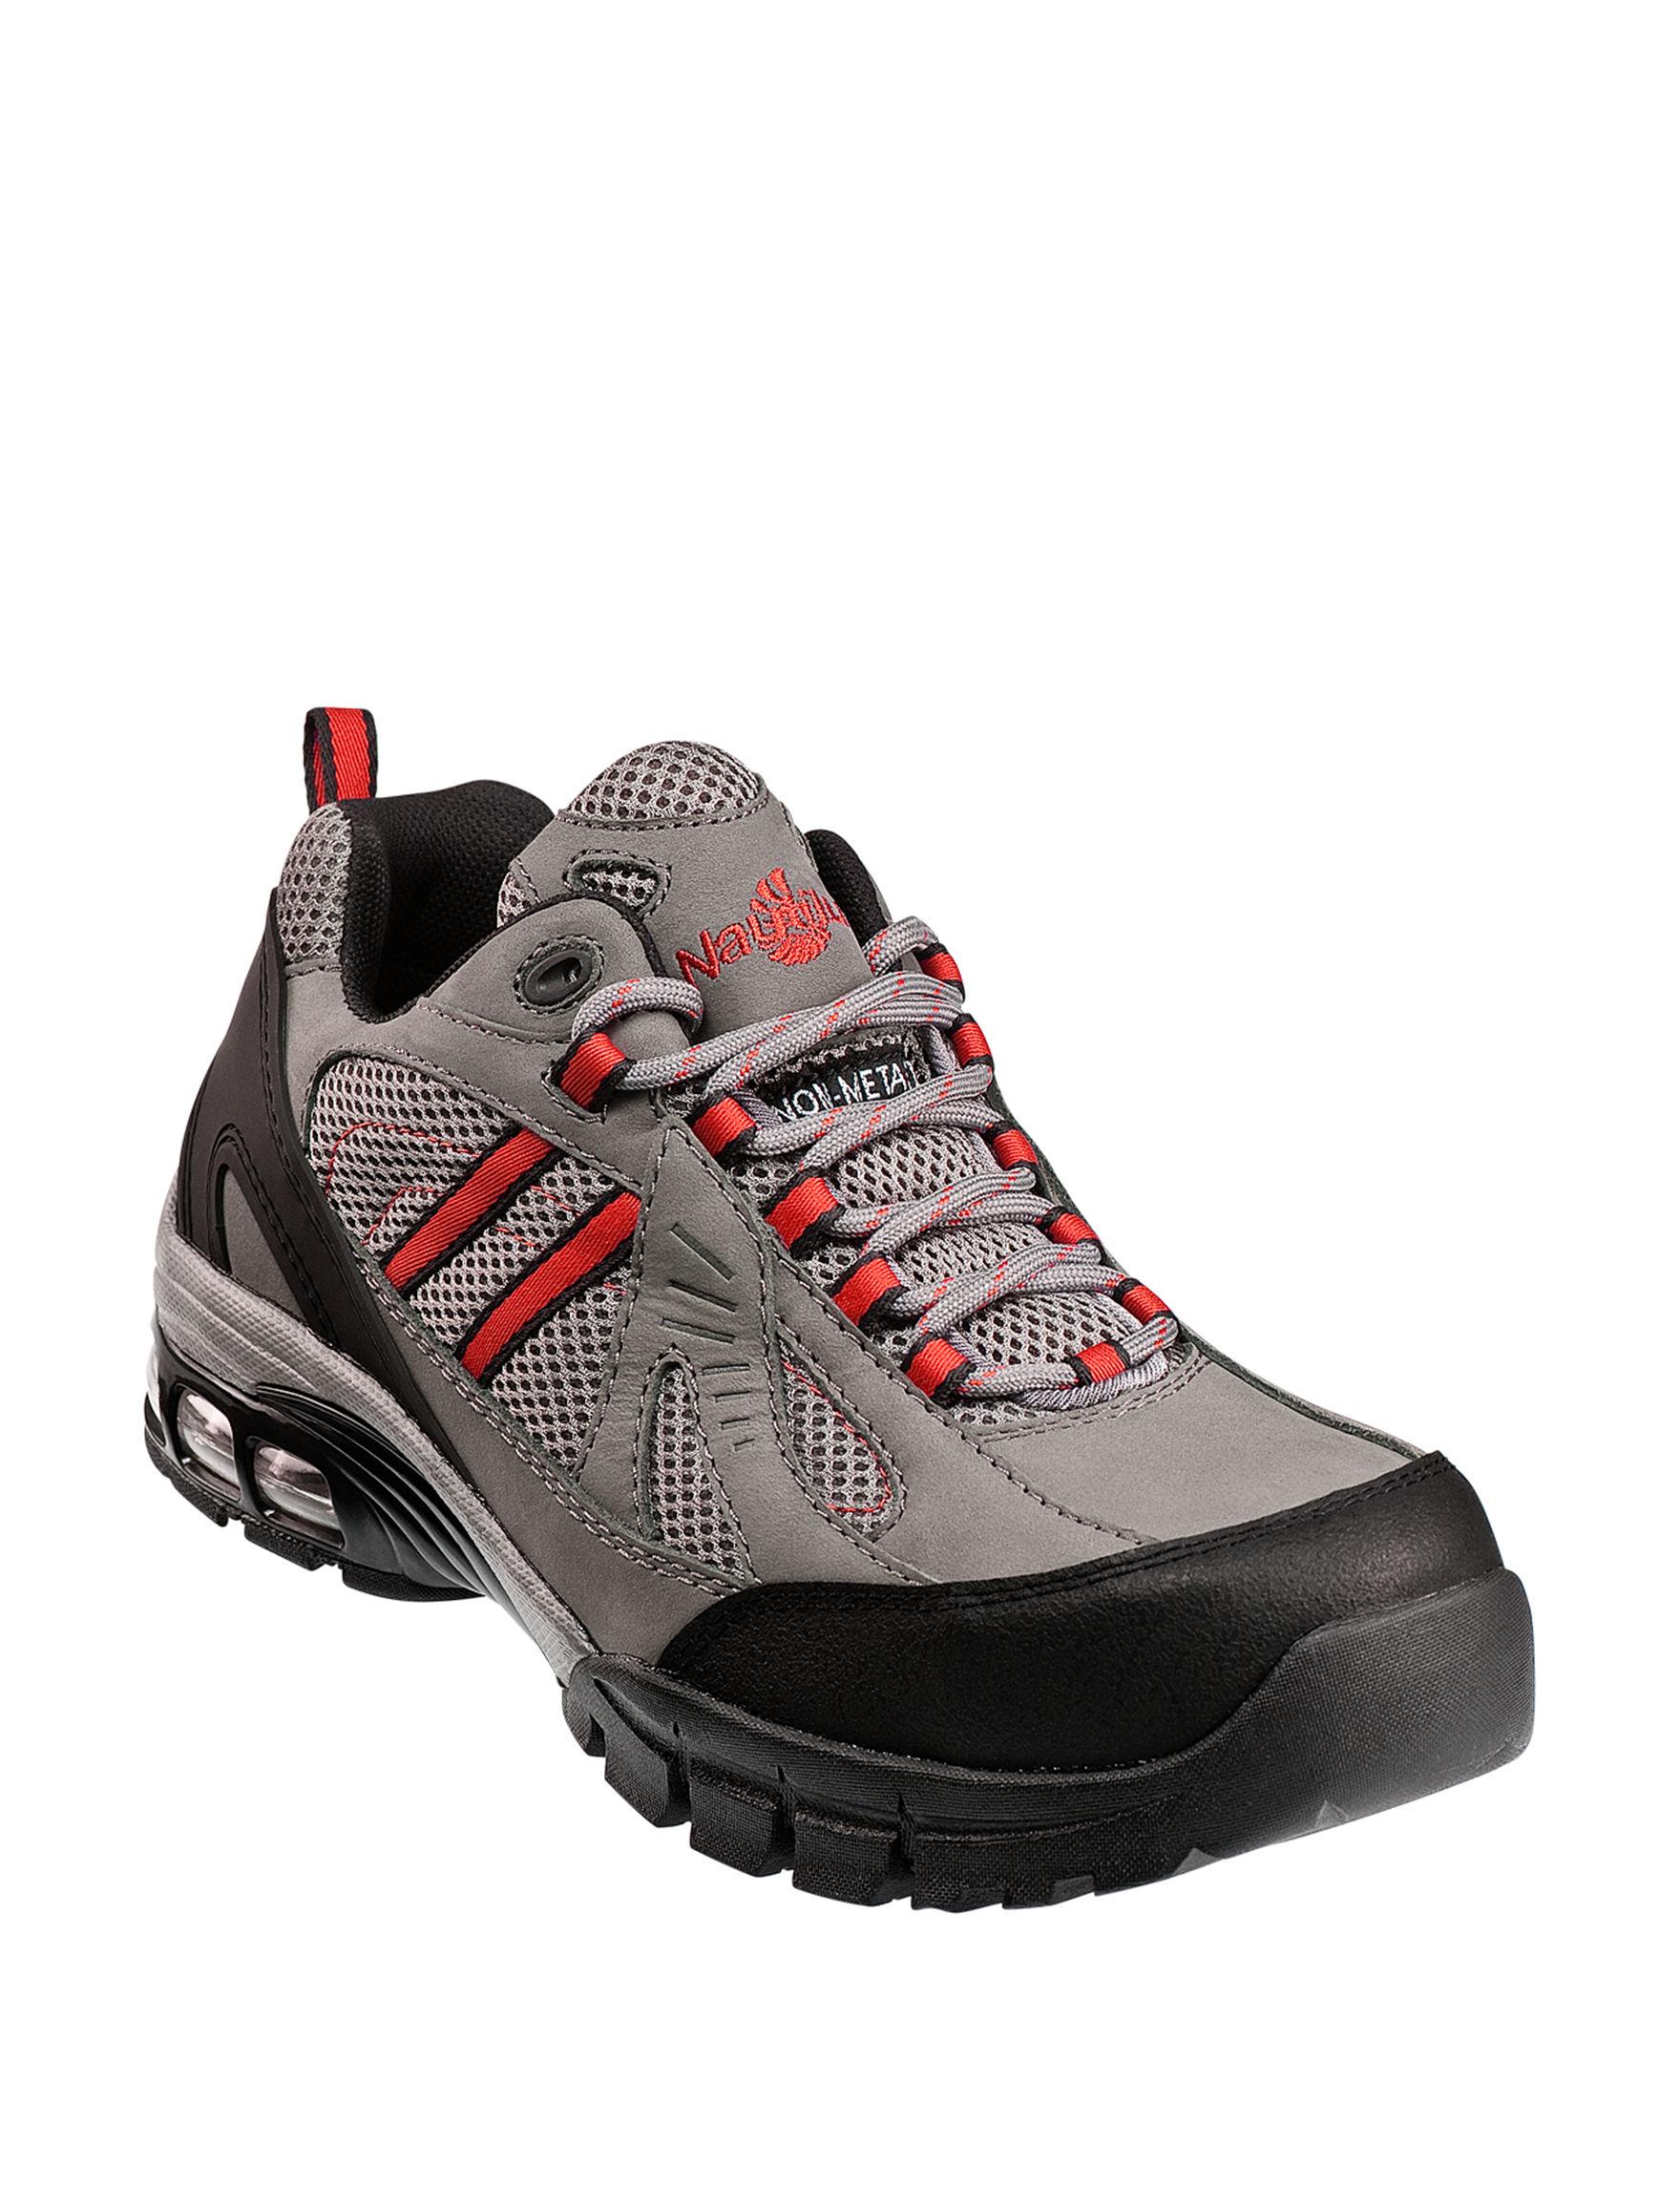 Nautilus Grey Hiking Boots